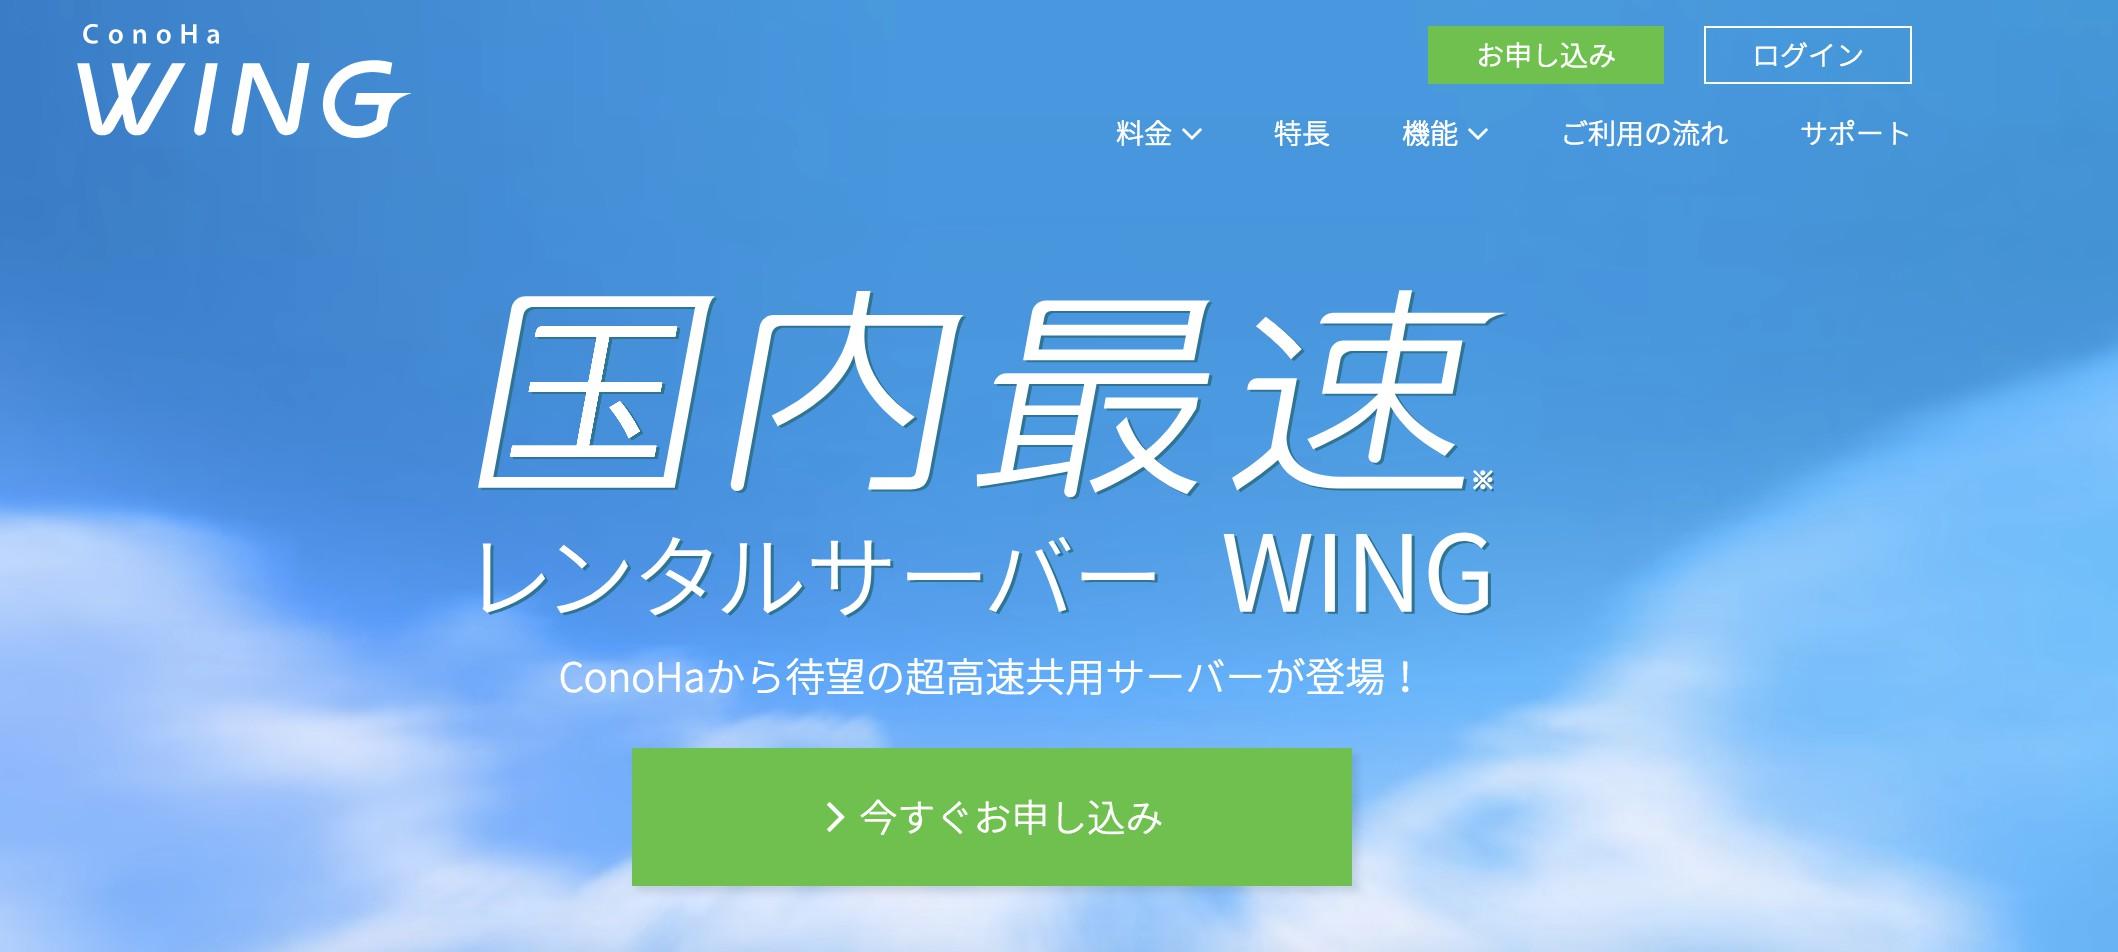 Conoha Wingは早い?移行は簡単?評判やメリット・デメリットを解説!